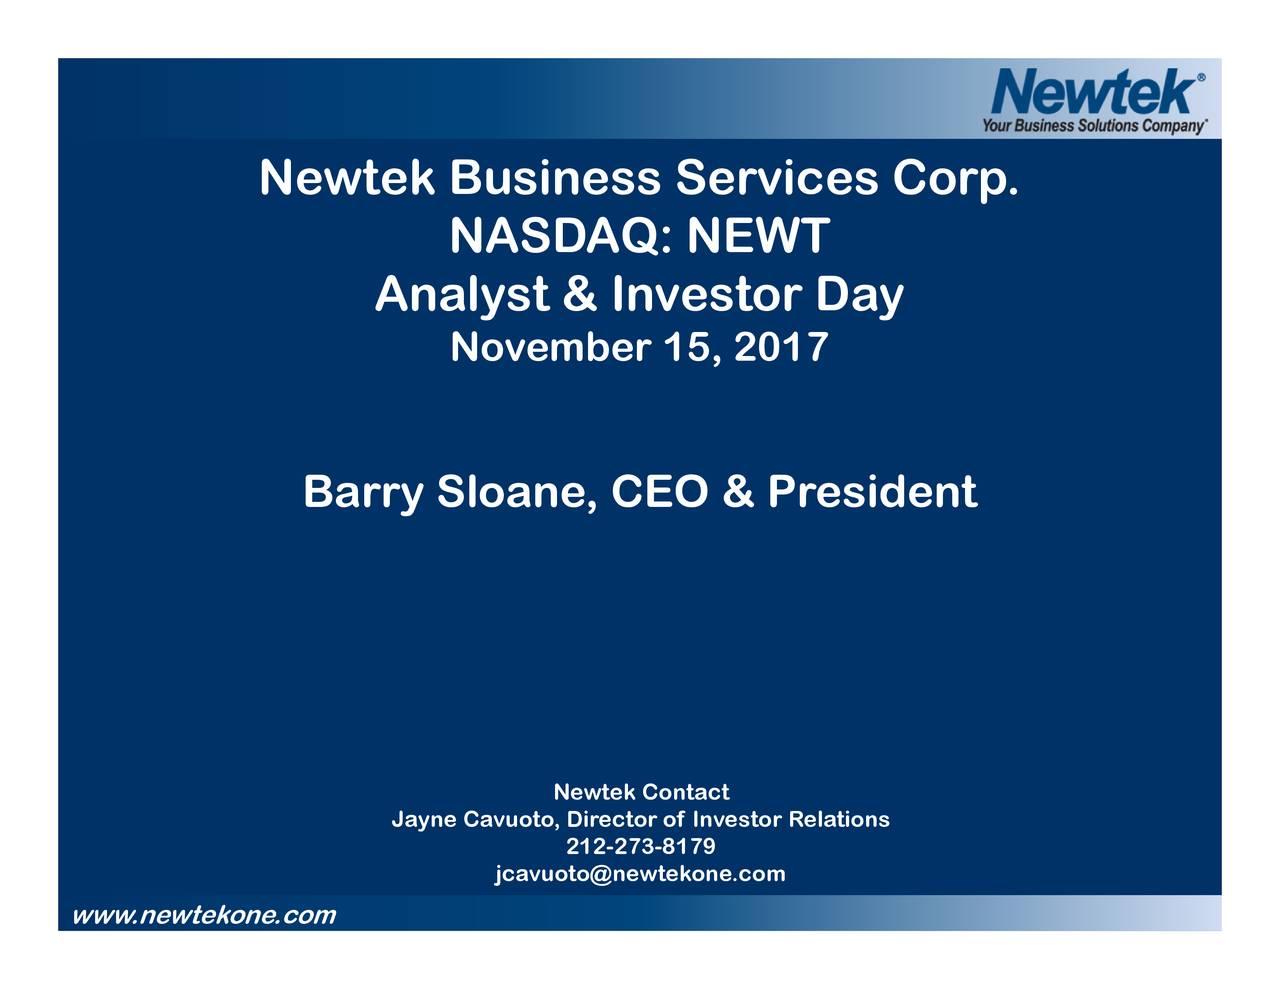 newtek business newt investor presentation slideshow newtek